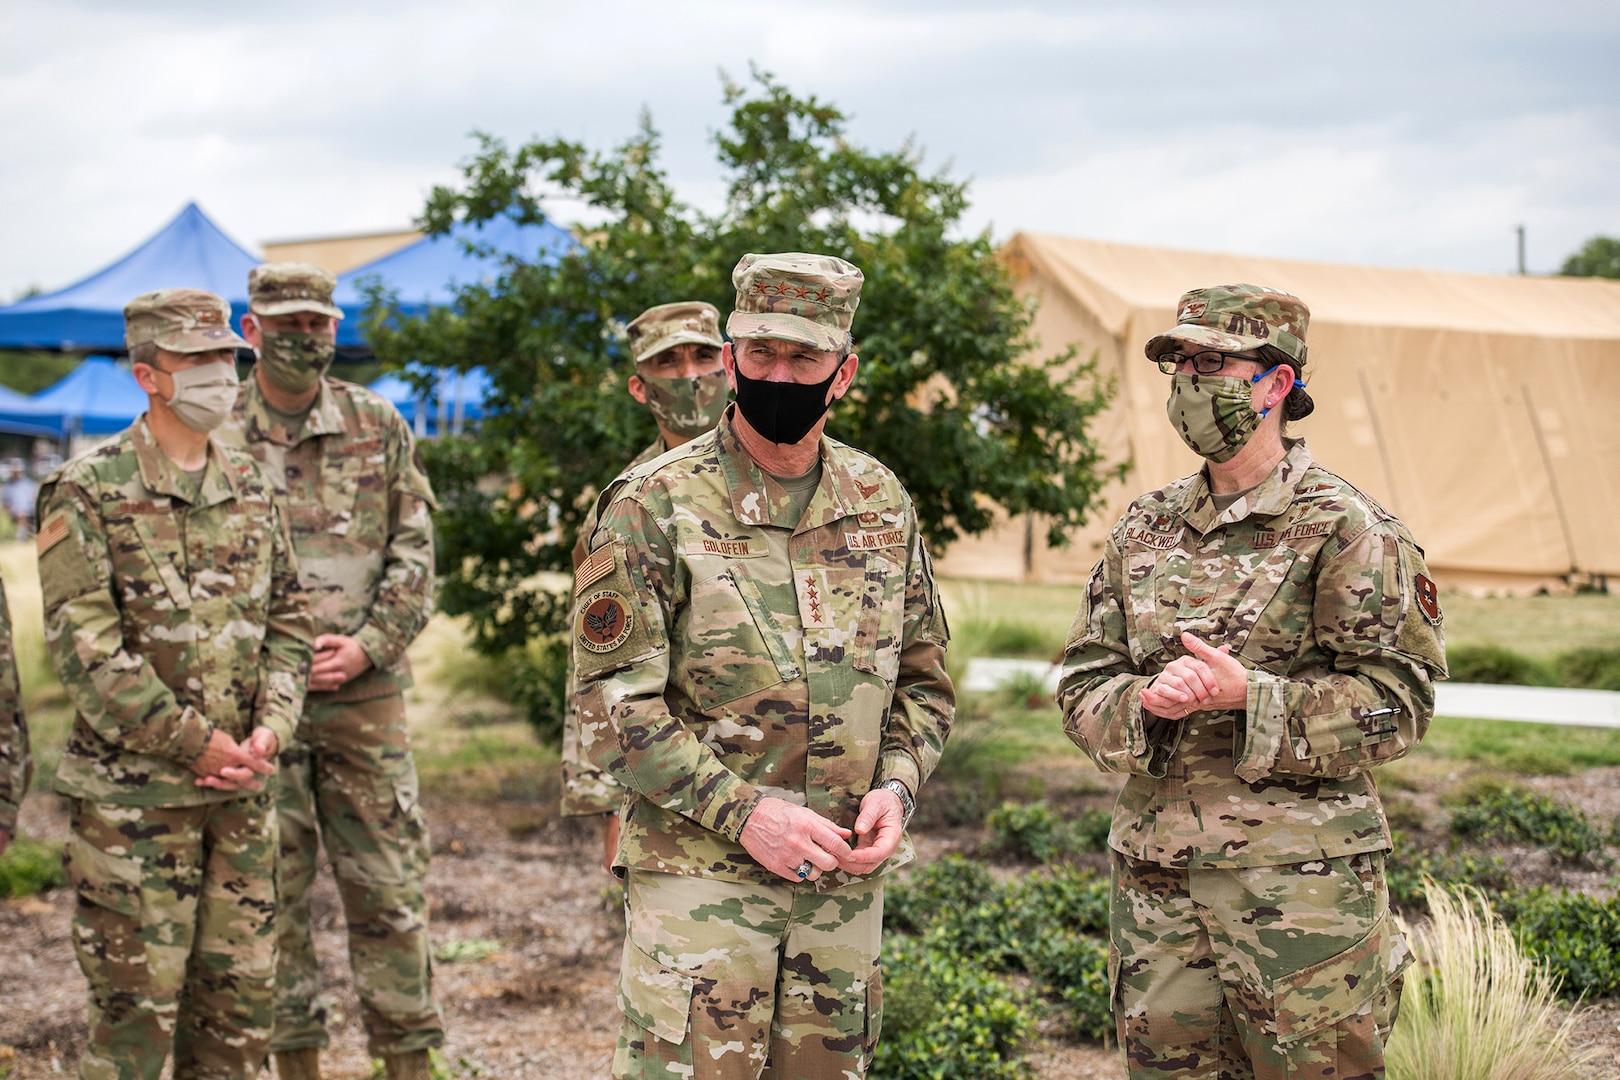 Air Force Chief of Staff Gen. David L. Goldfein (center) visits Reid Clinic May 7, 2020, at Joint Base San Antonio-Lackland, Texas.